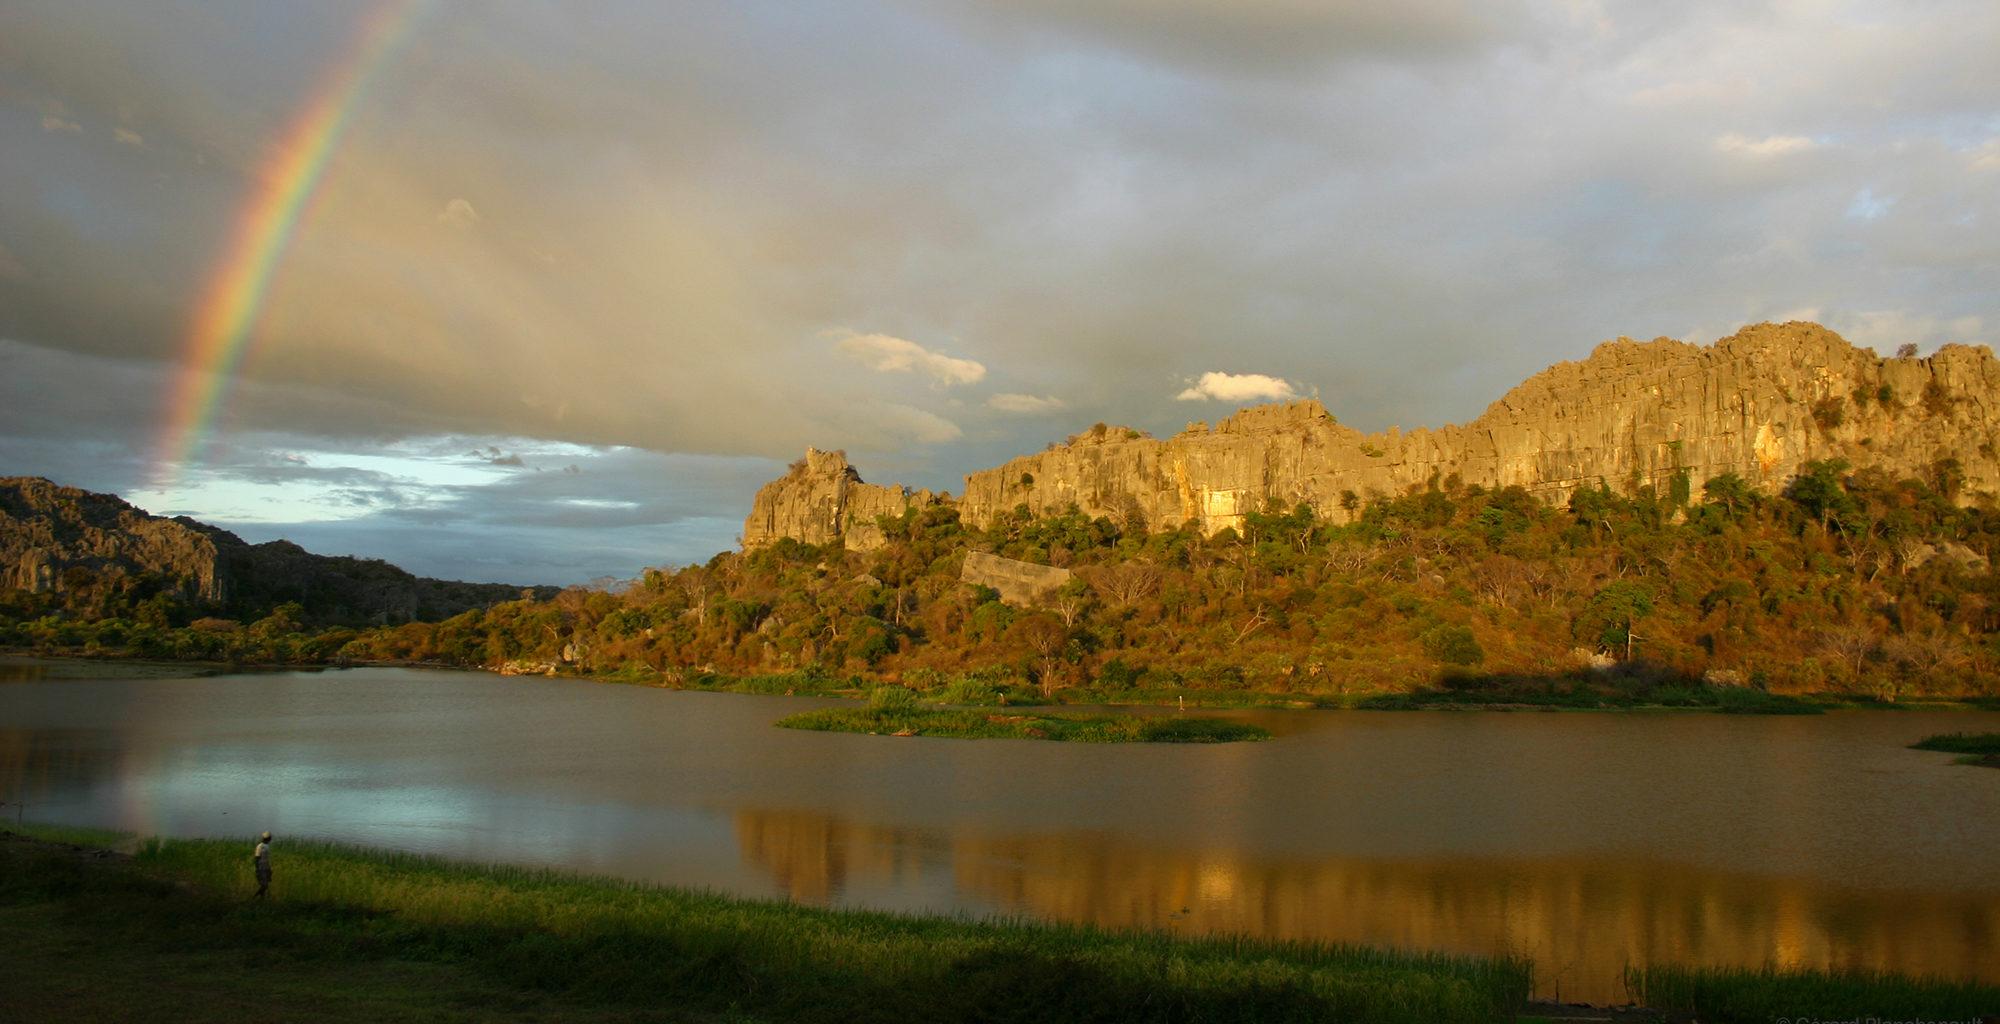 North-Madagascar-Rainbow-Landscape